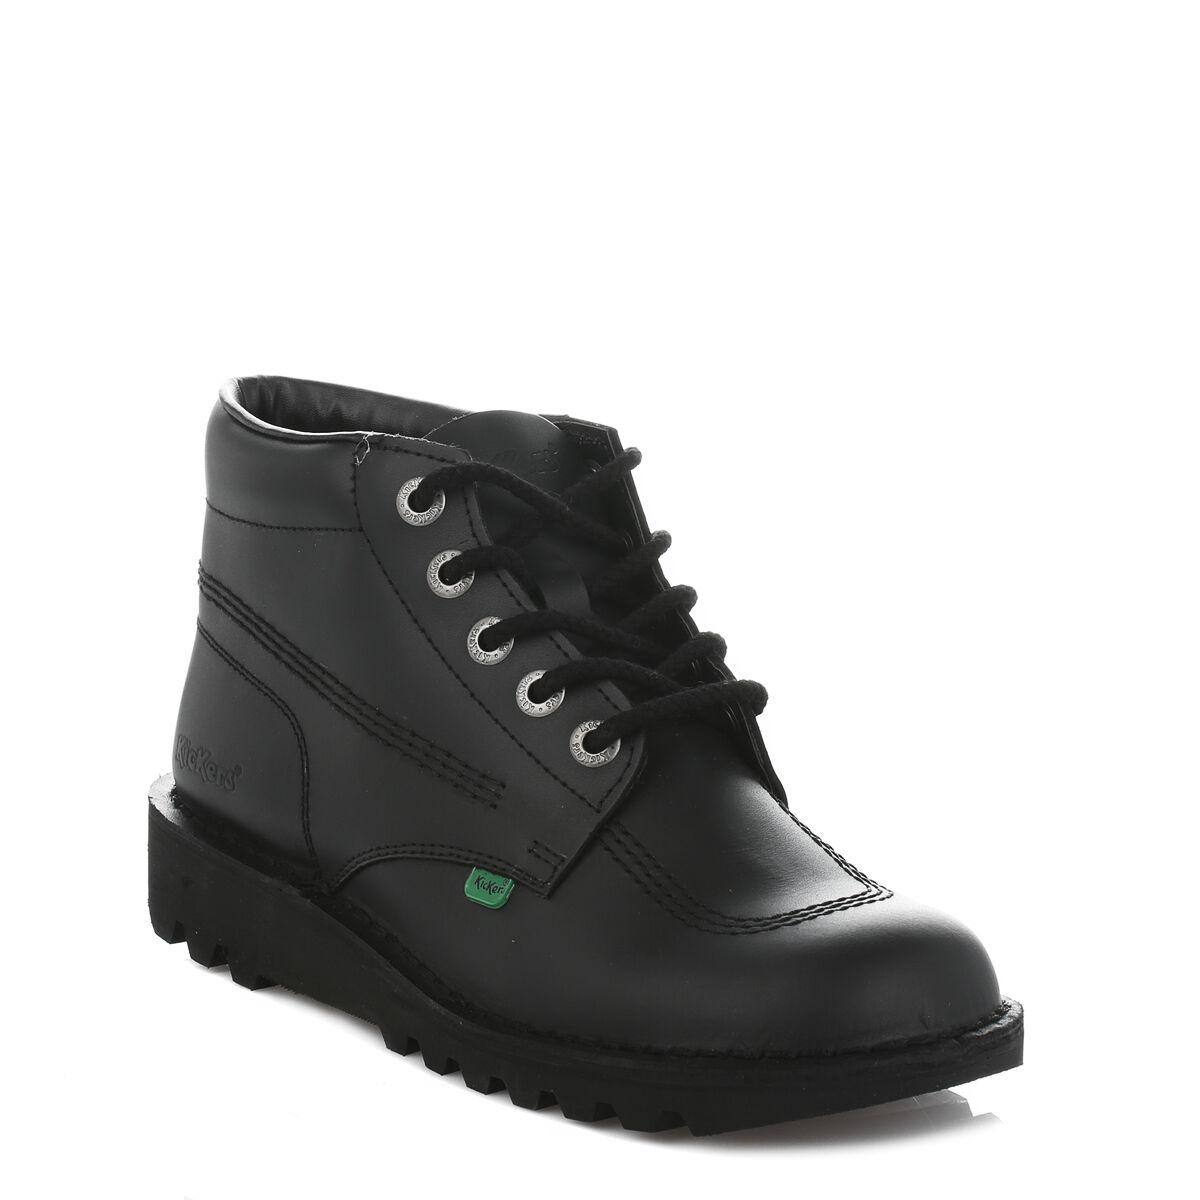 Kickers Kick Hi Core Mens Black Leather Boots, Ankle shoes